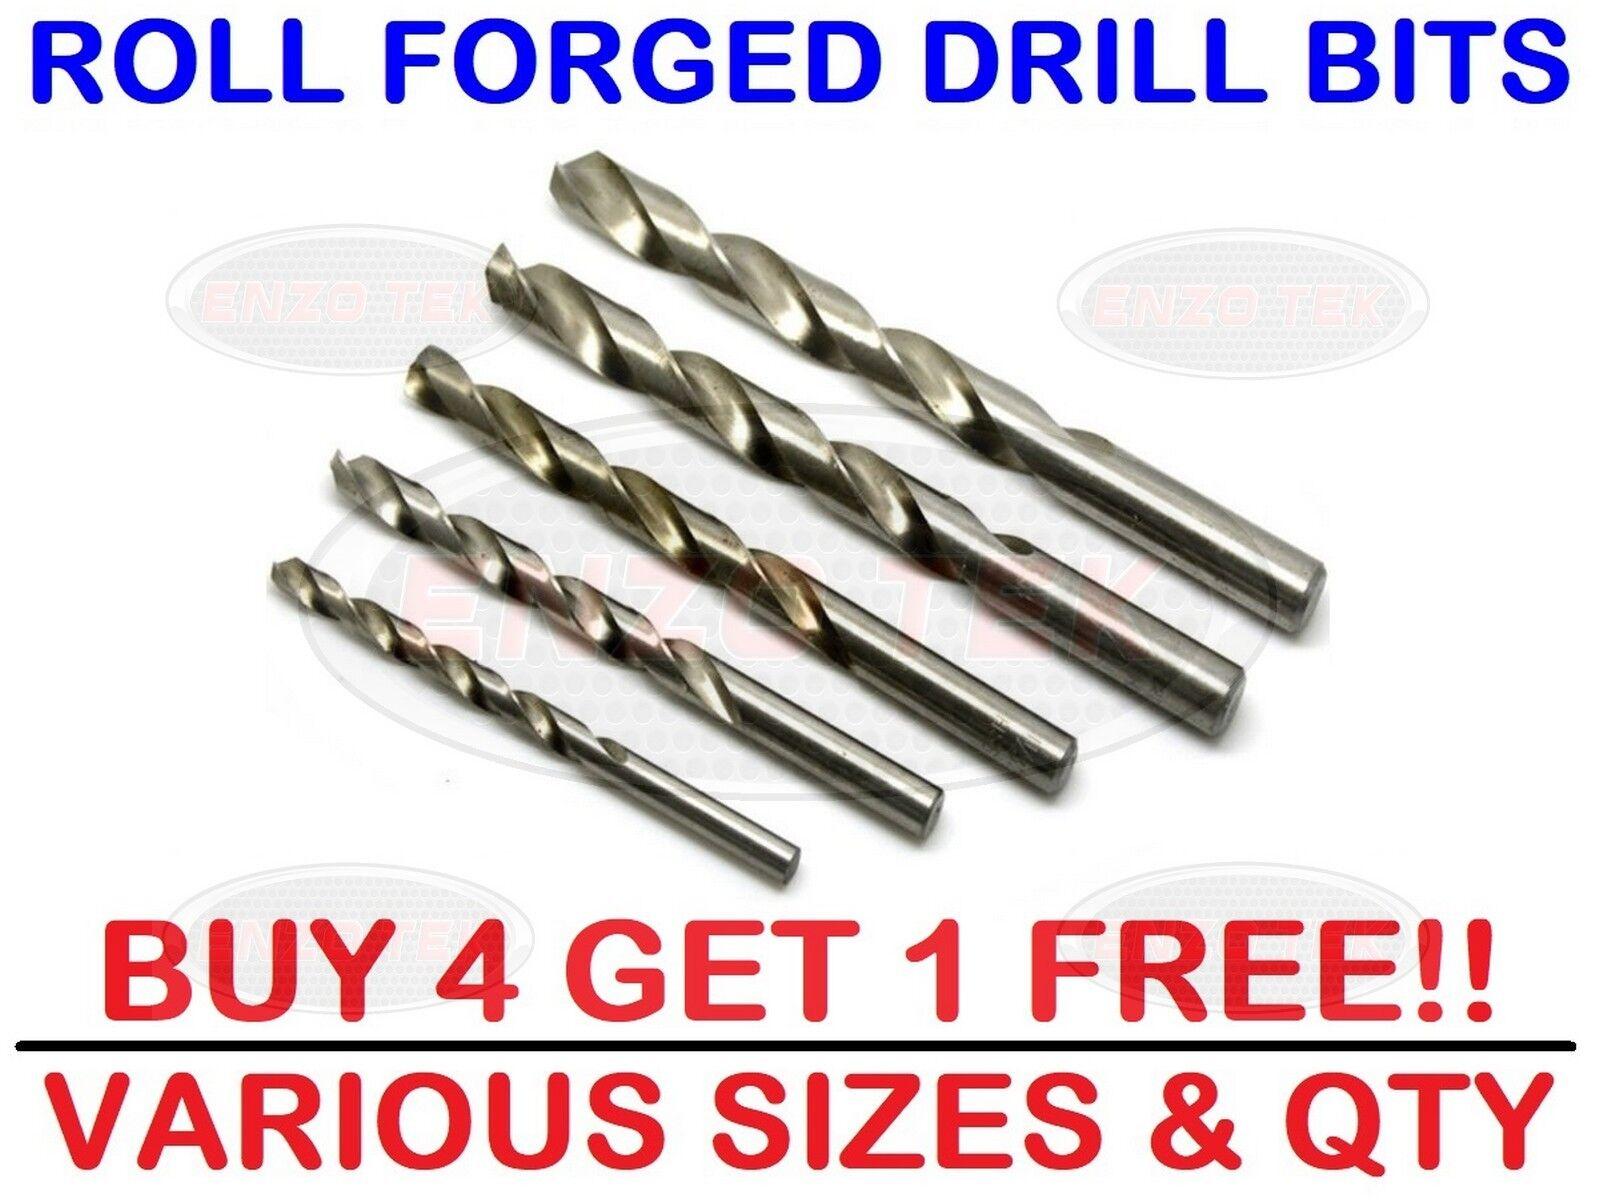 Metric HSS Roll Forged Drill Bits